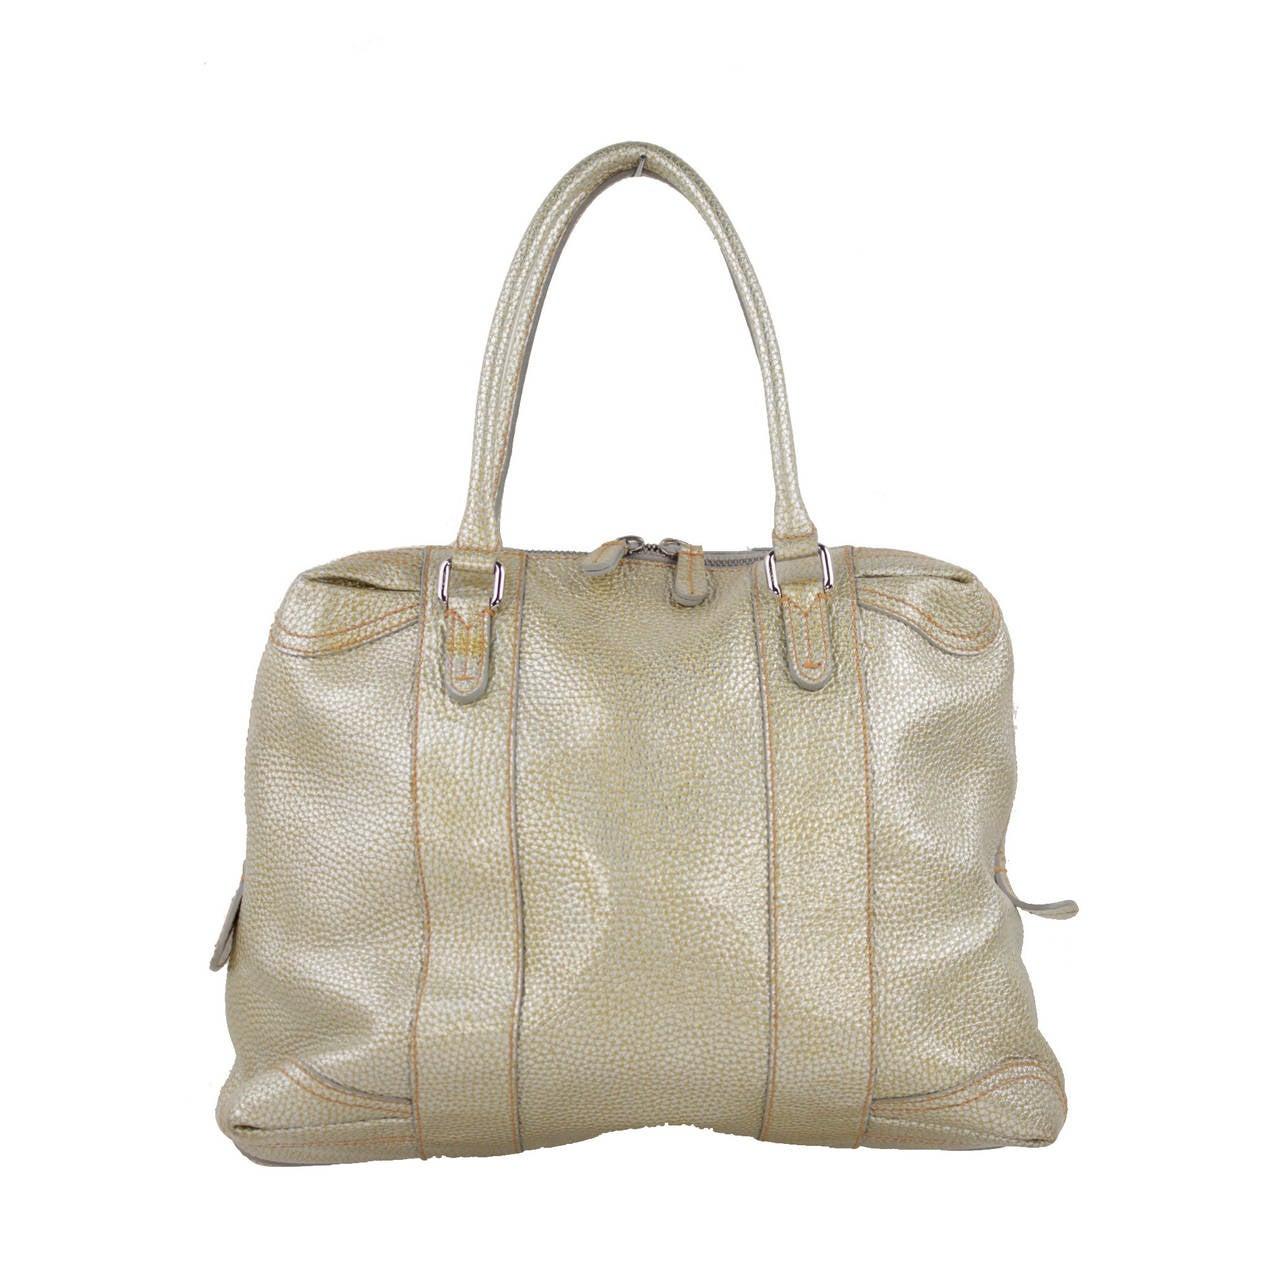 dd4a3ff7c07a FENDI Italian Golden Pebbled Leather B MIX TOTE Large Handbag SATCHEL For  Sale